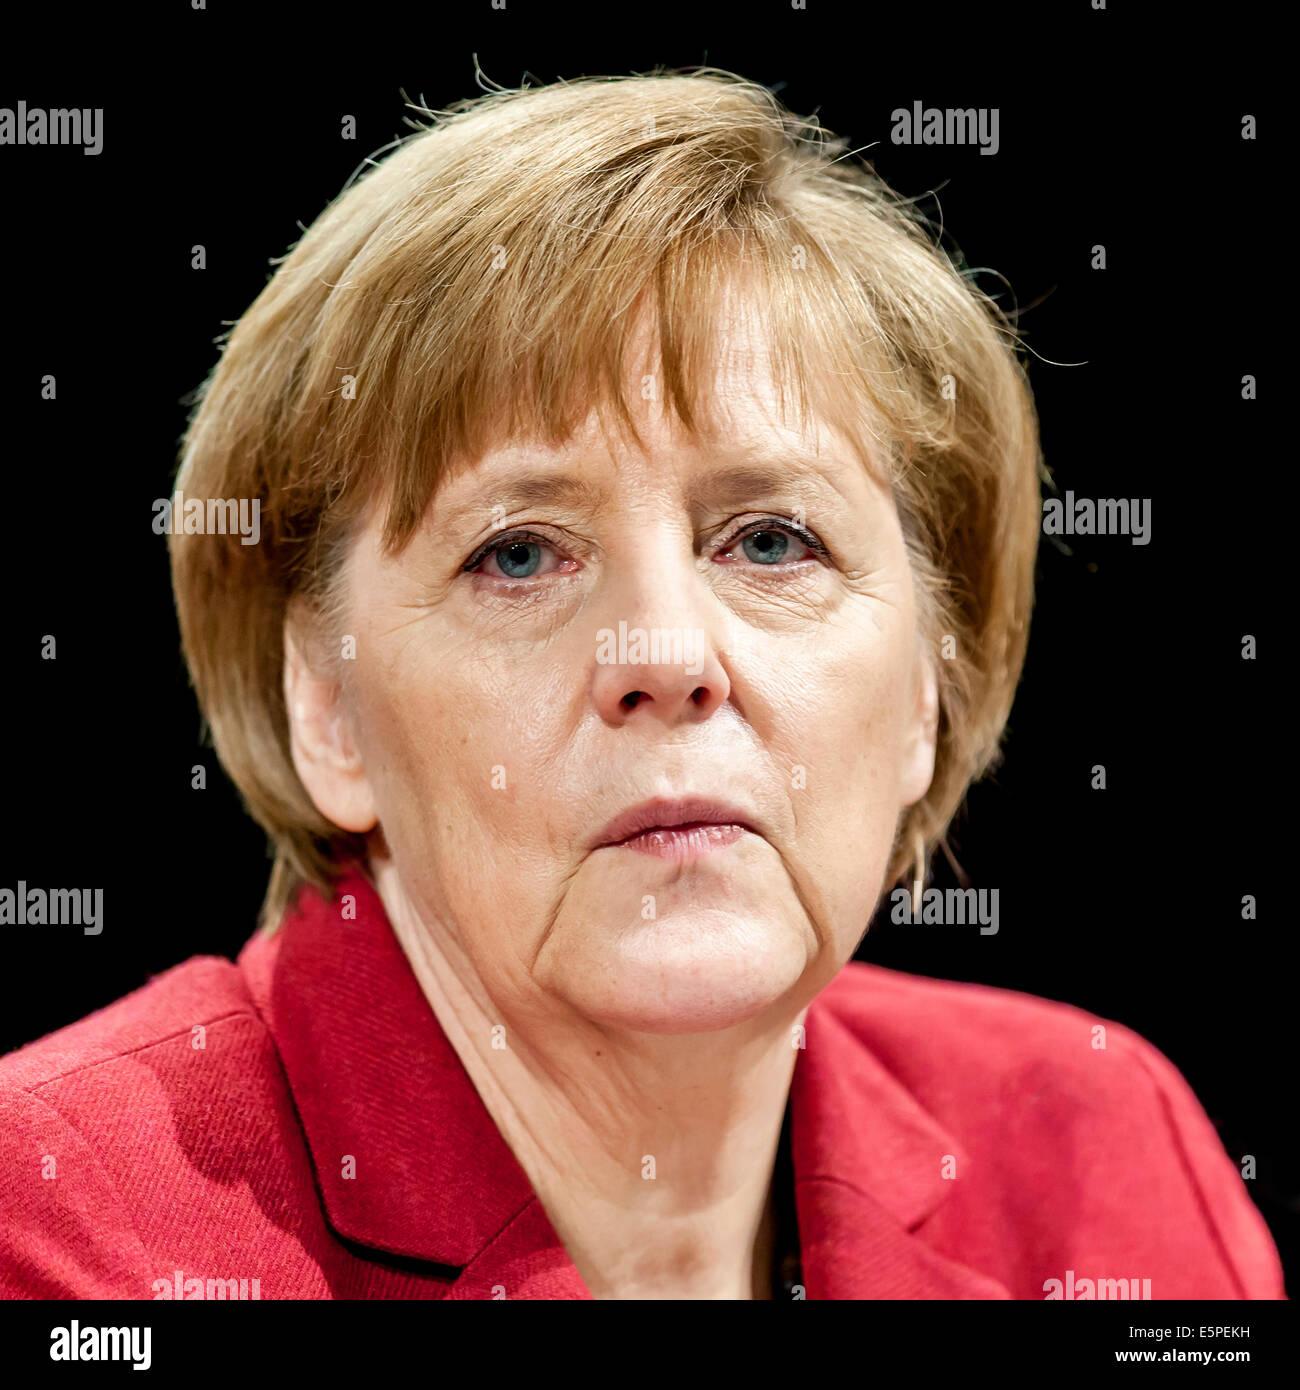 Angela Merkel, Chancellor of Germany, Germany - Stock Image